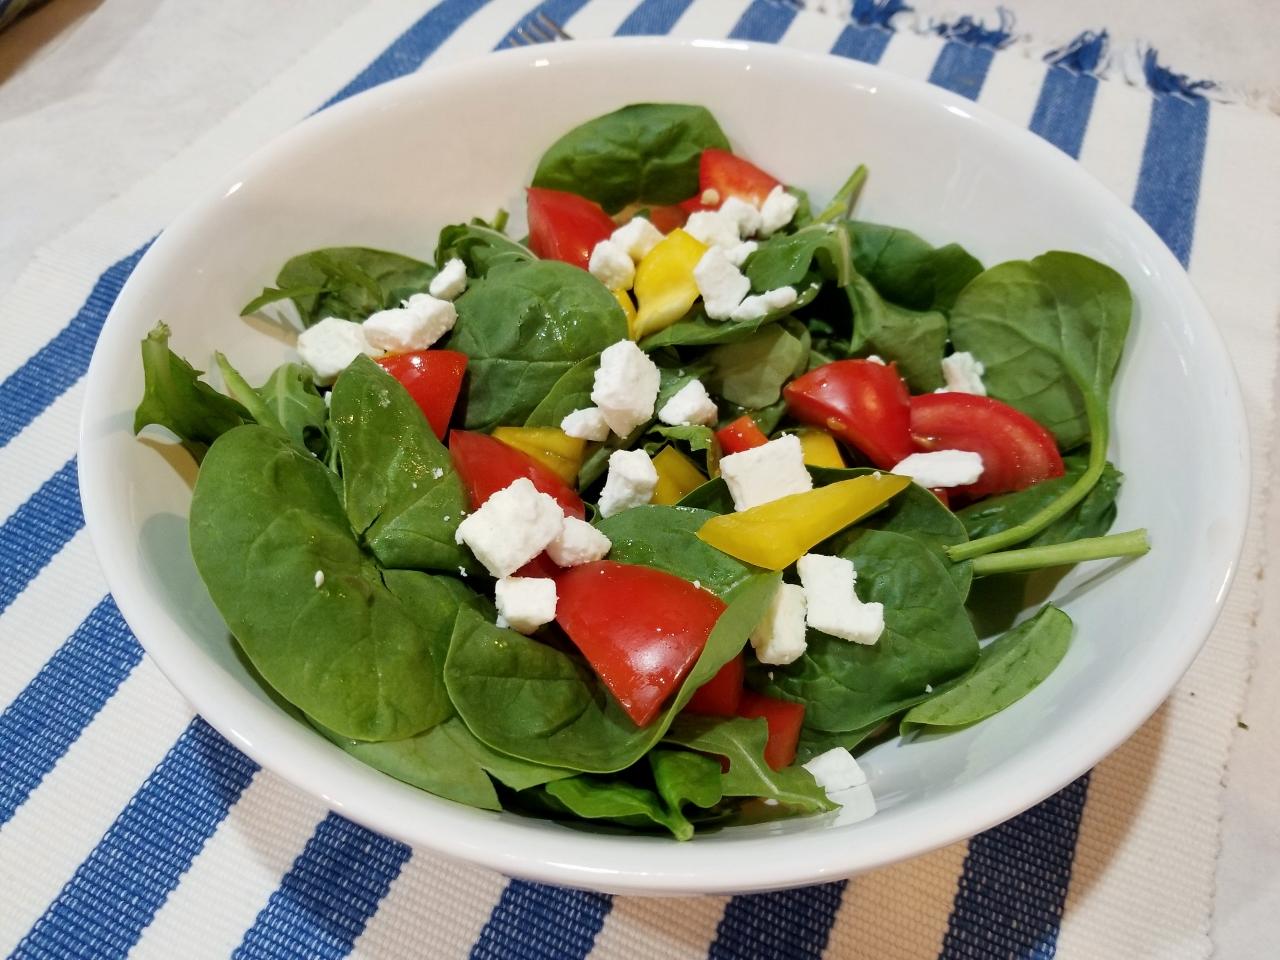 Greek Salad Food First Before Friday challenge